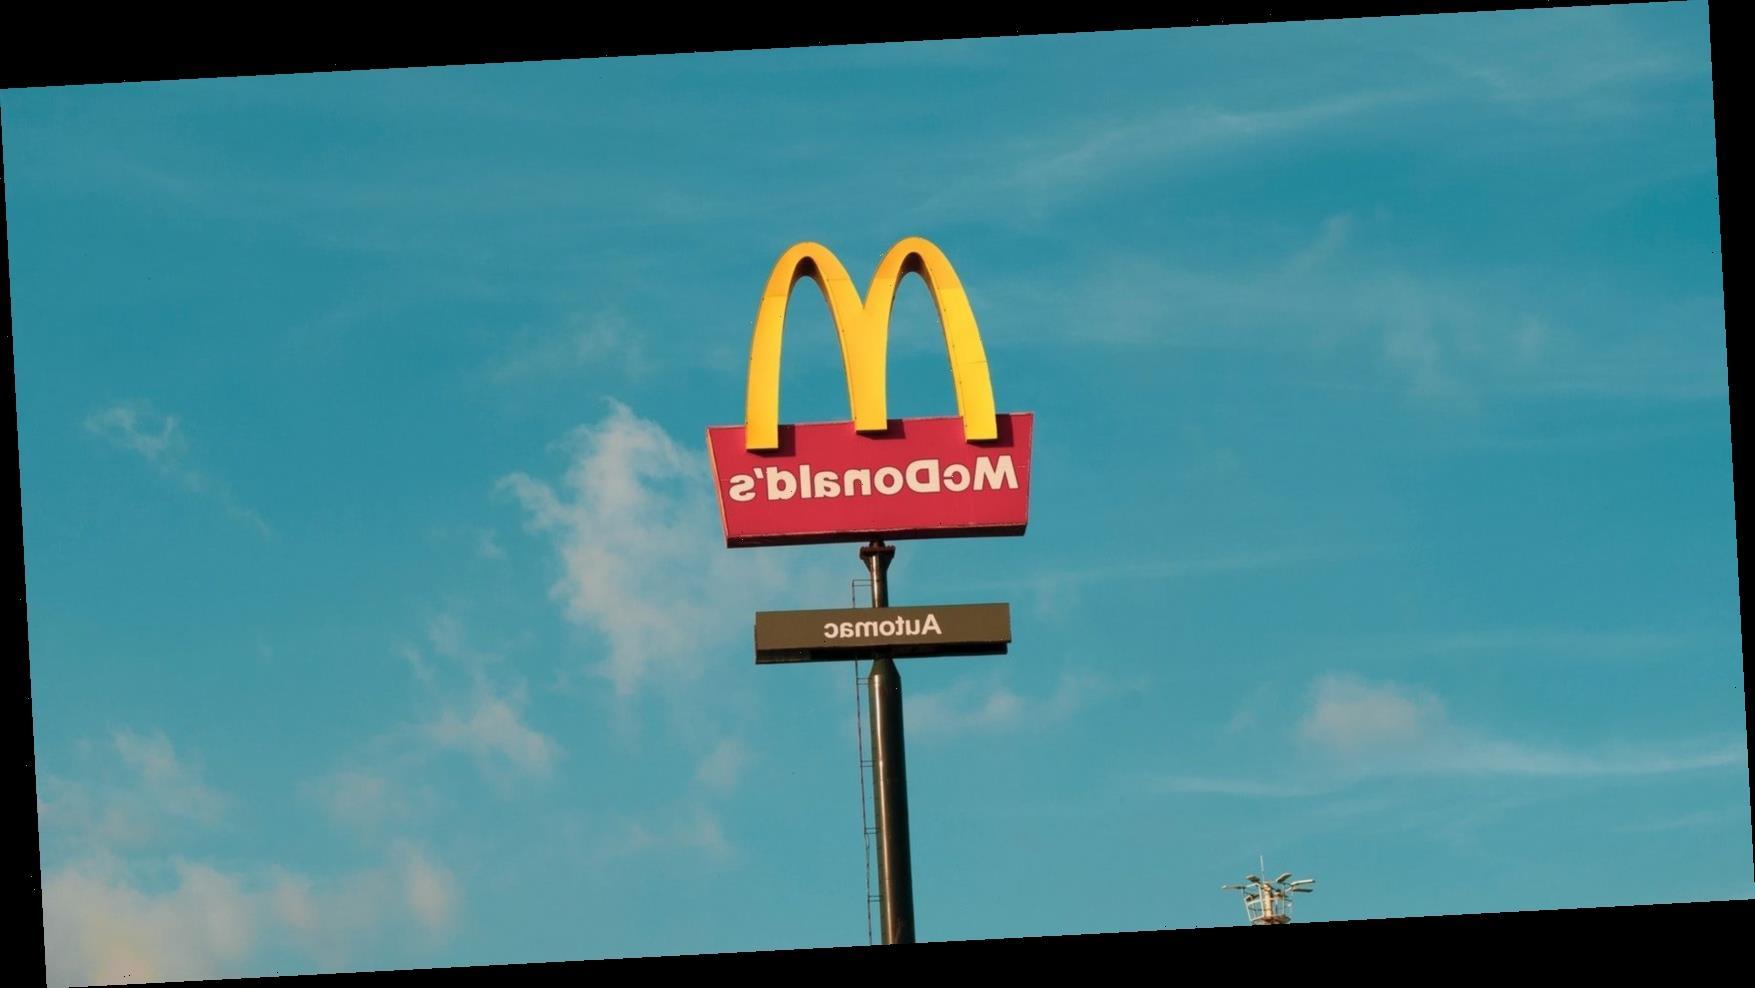 5 Fanciest McDonald's Locations Around The World